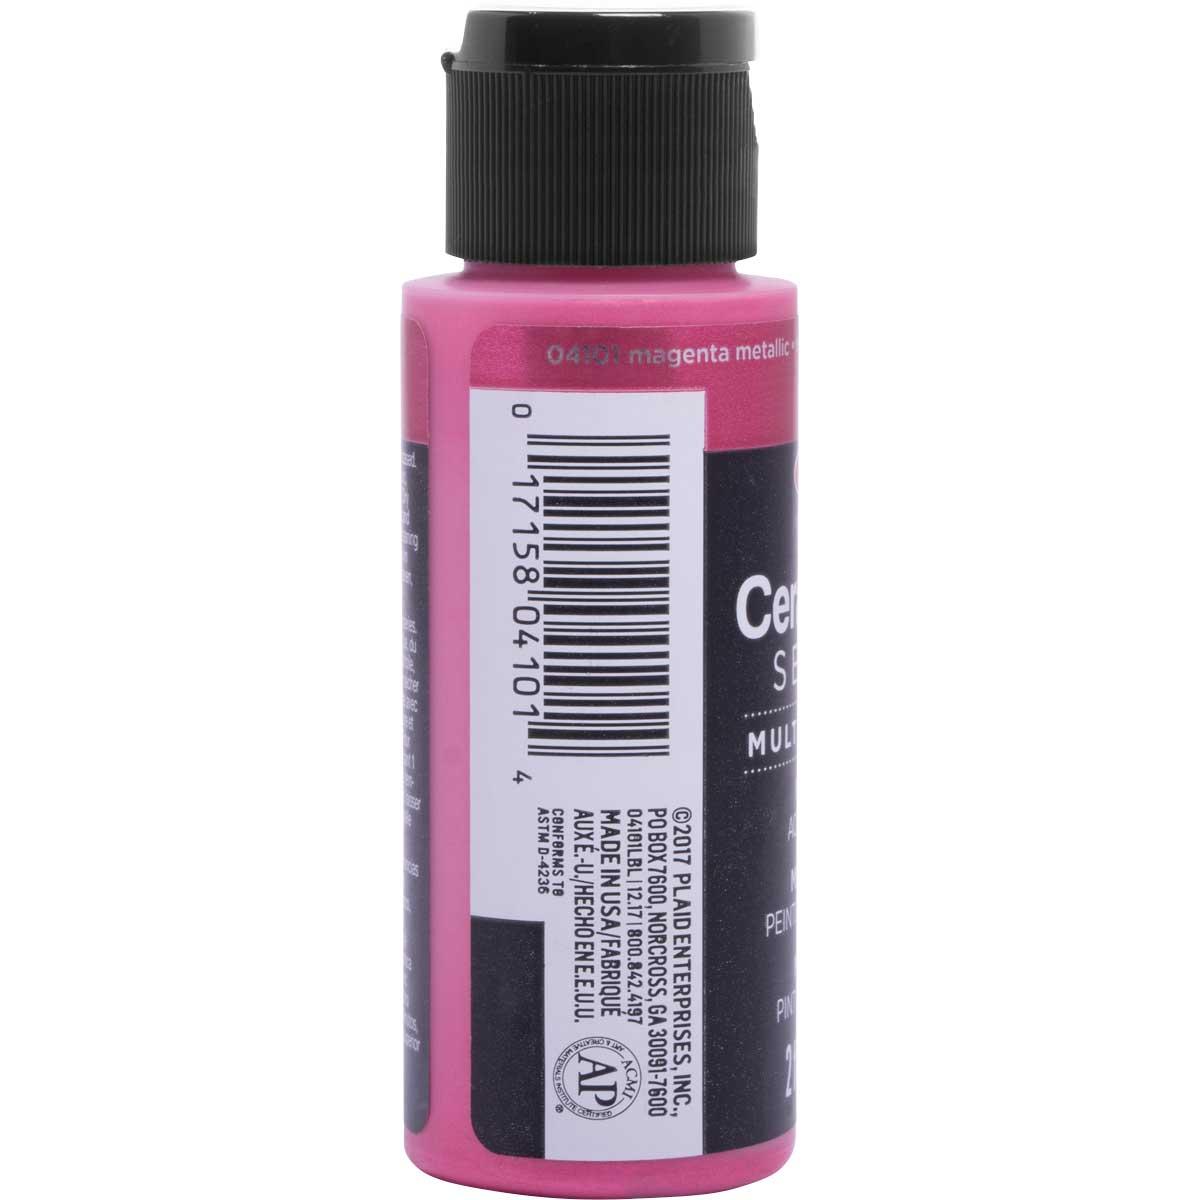 Delta Ceramcoat ® Select Multi-Surface Acrylic Paint - Metallic - Magenta, 2 oz.